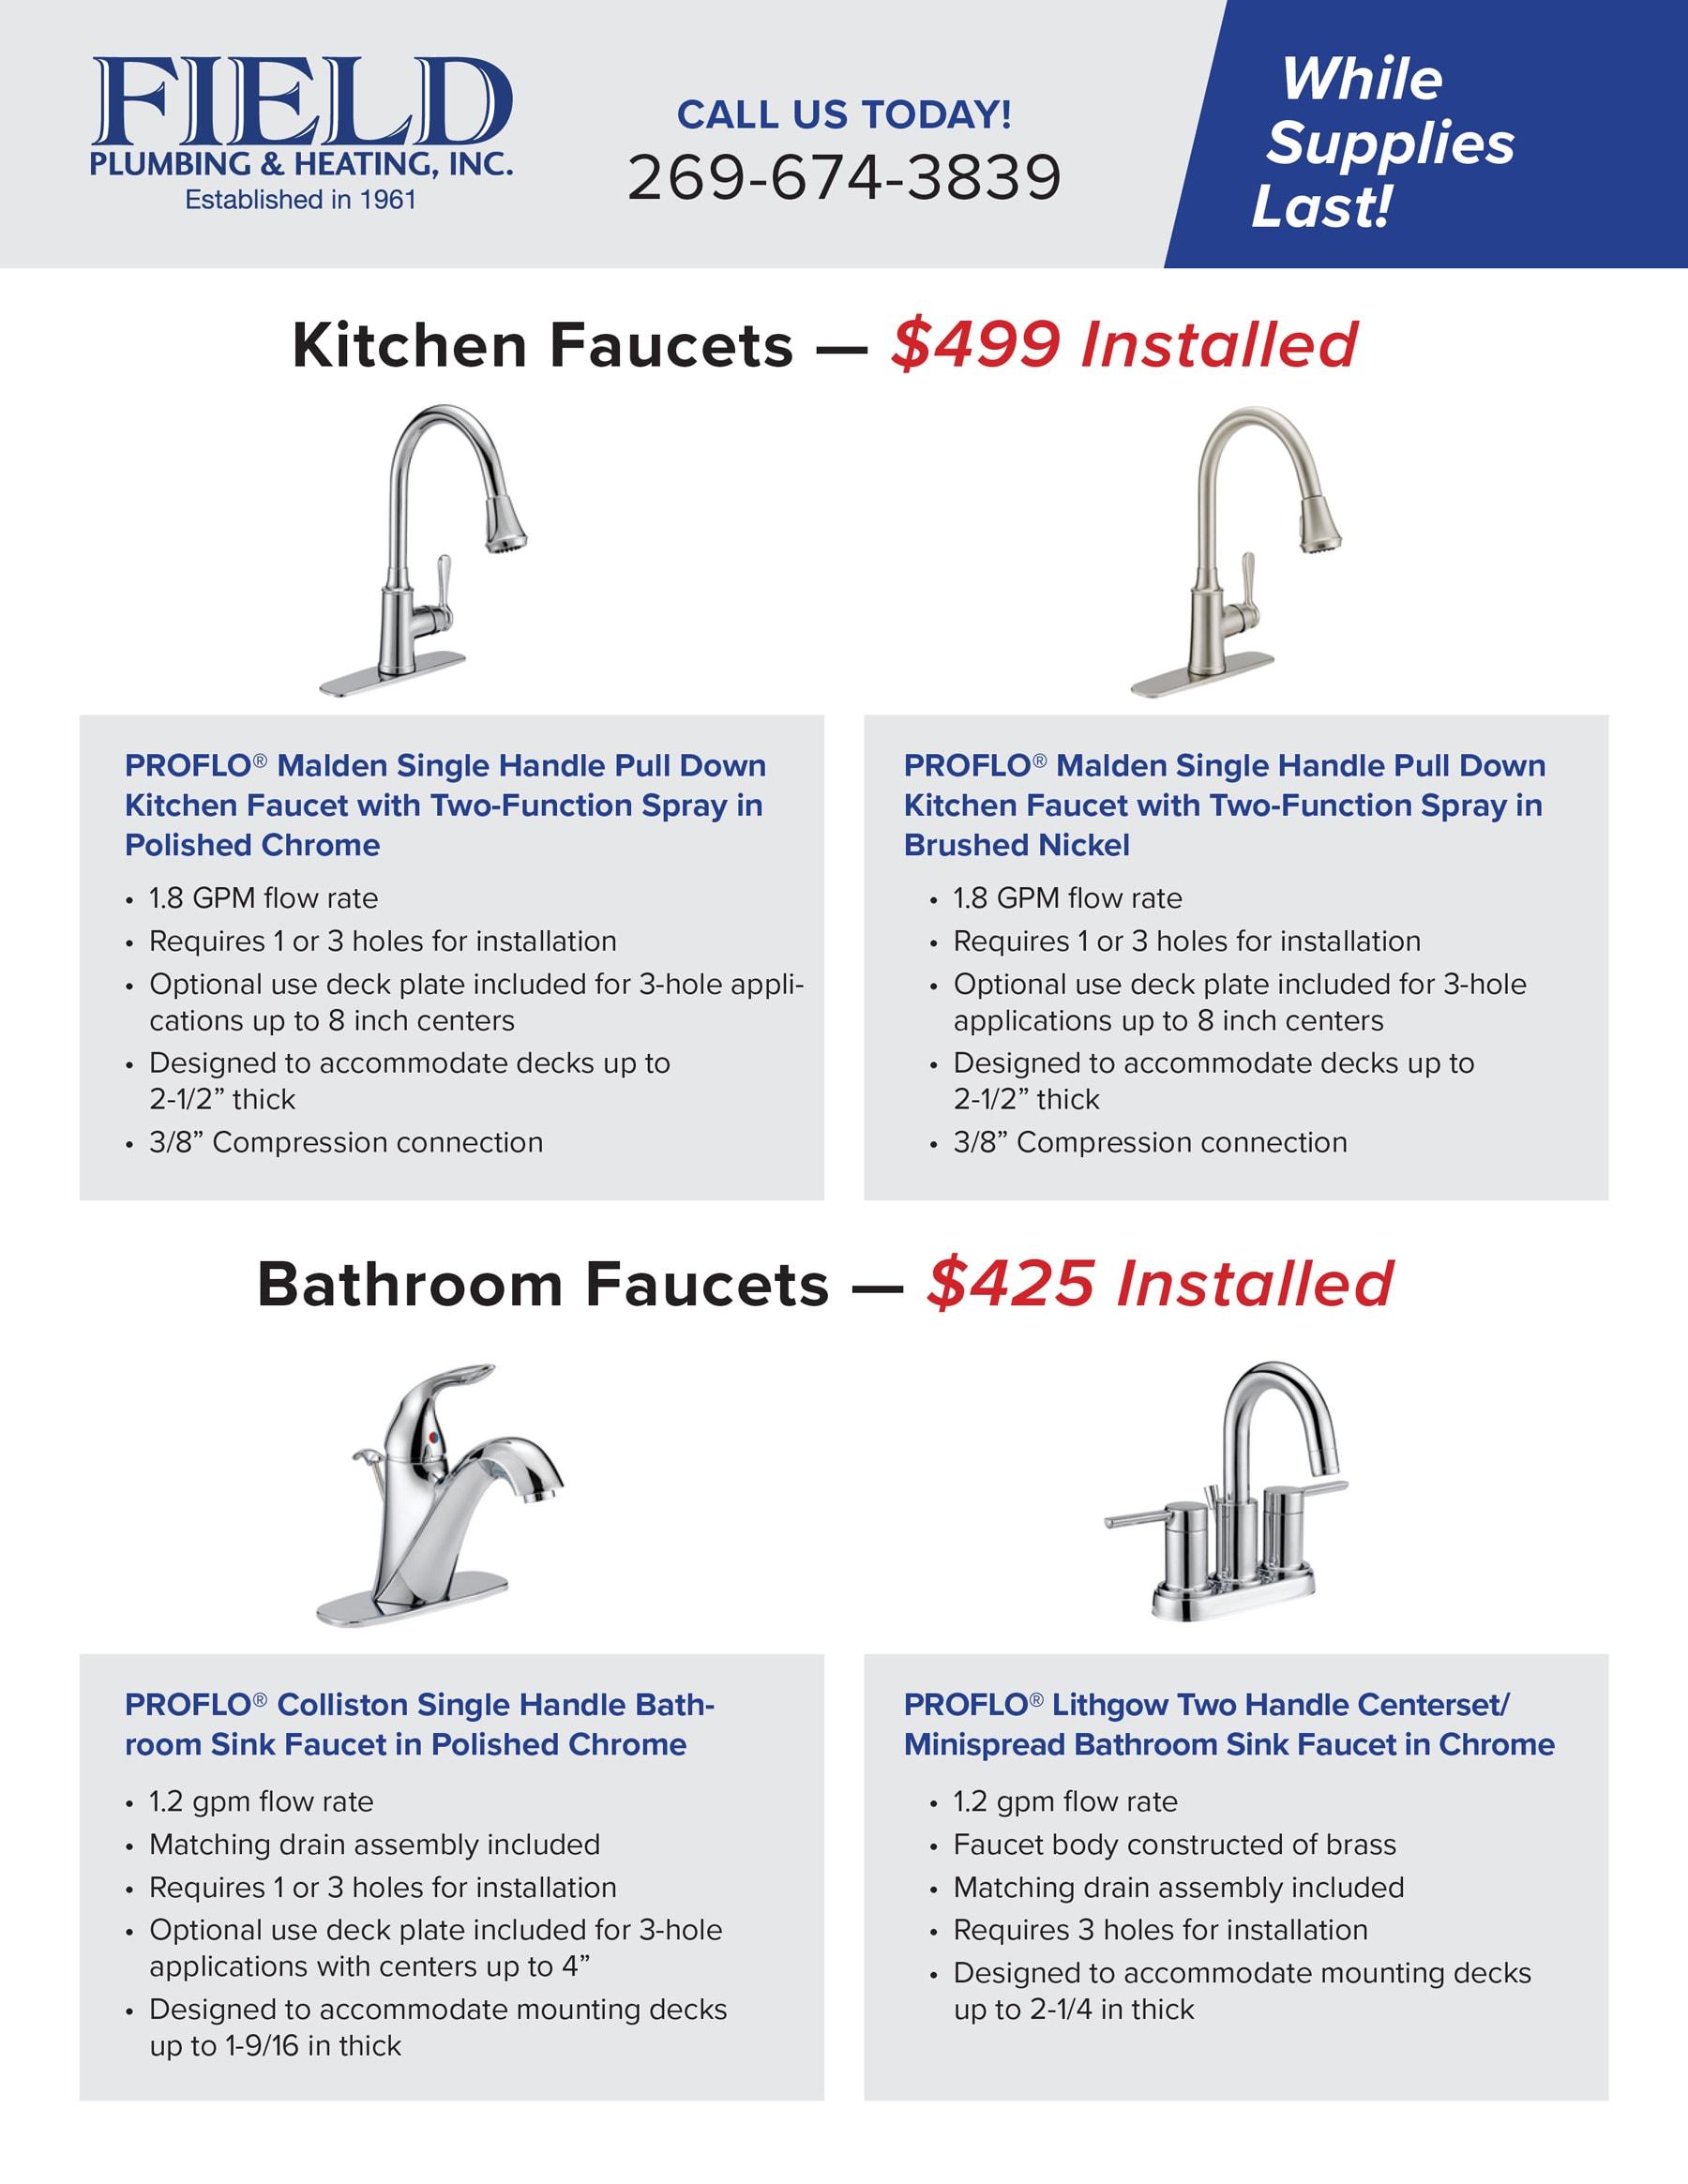 faucet flyer special